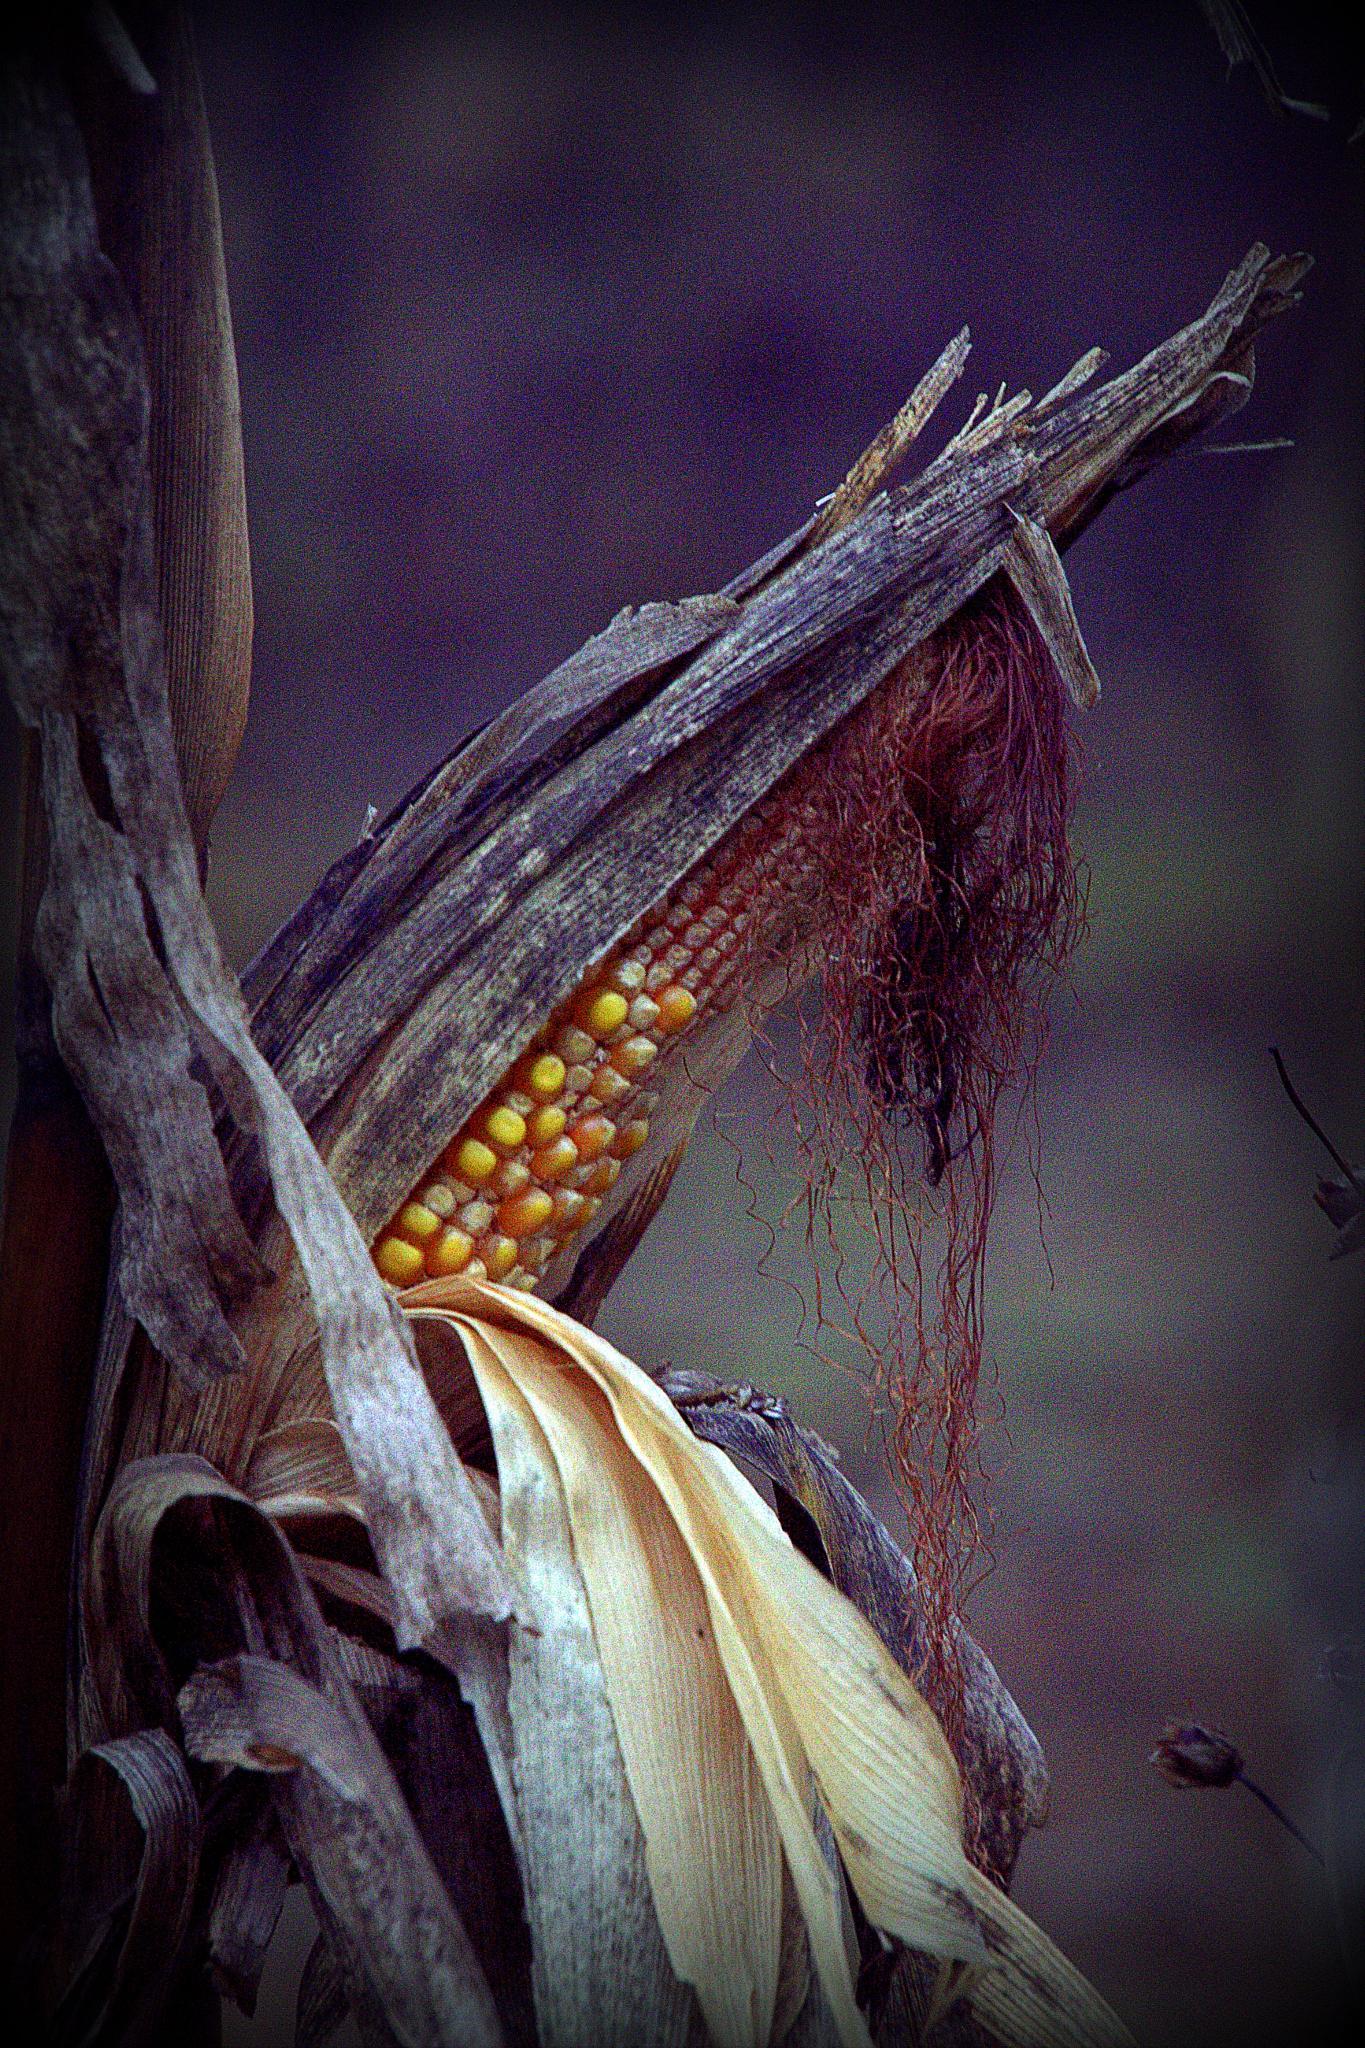 Landscape - remnants of food venison by leopold.brzin